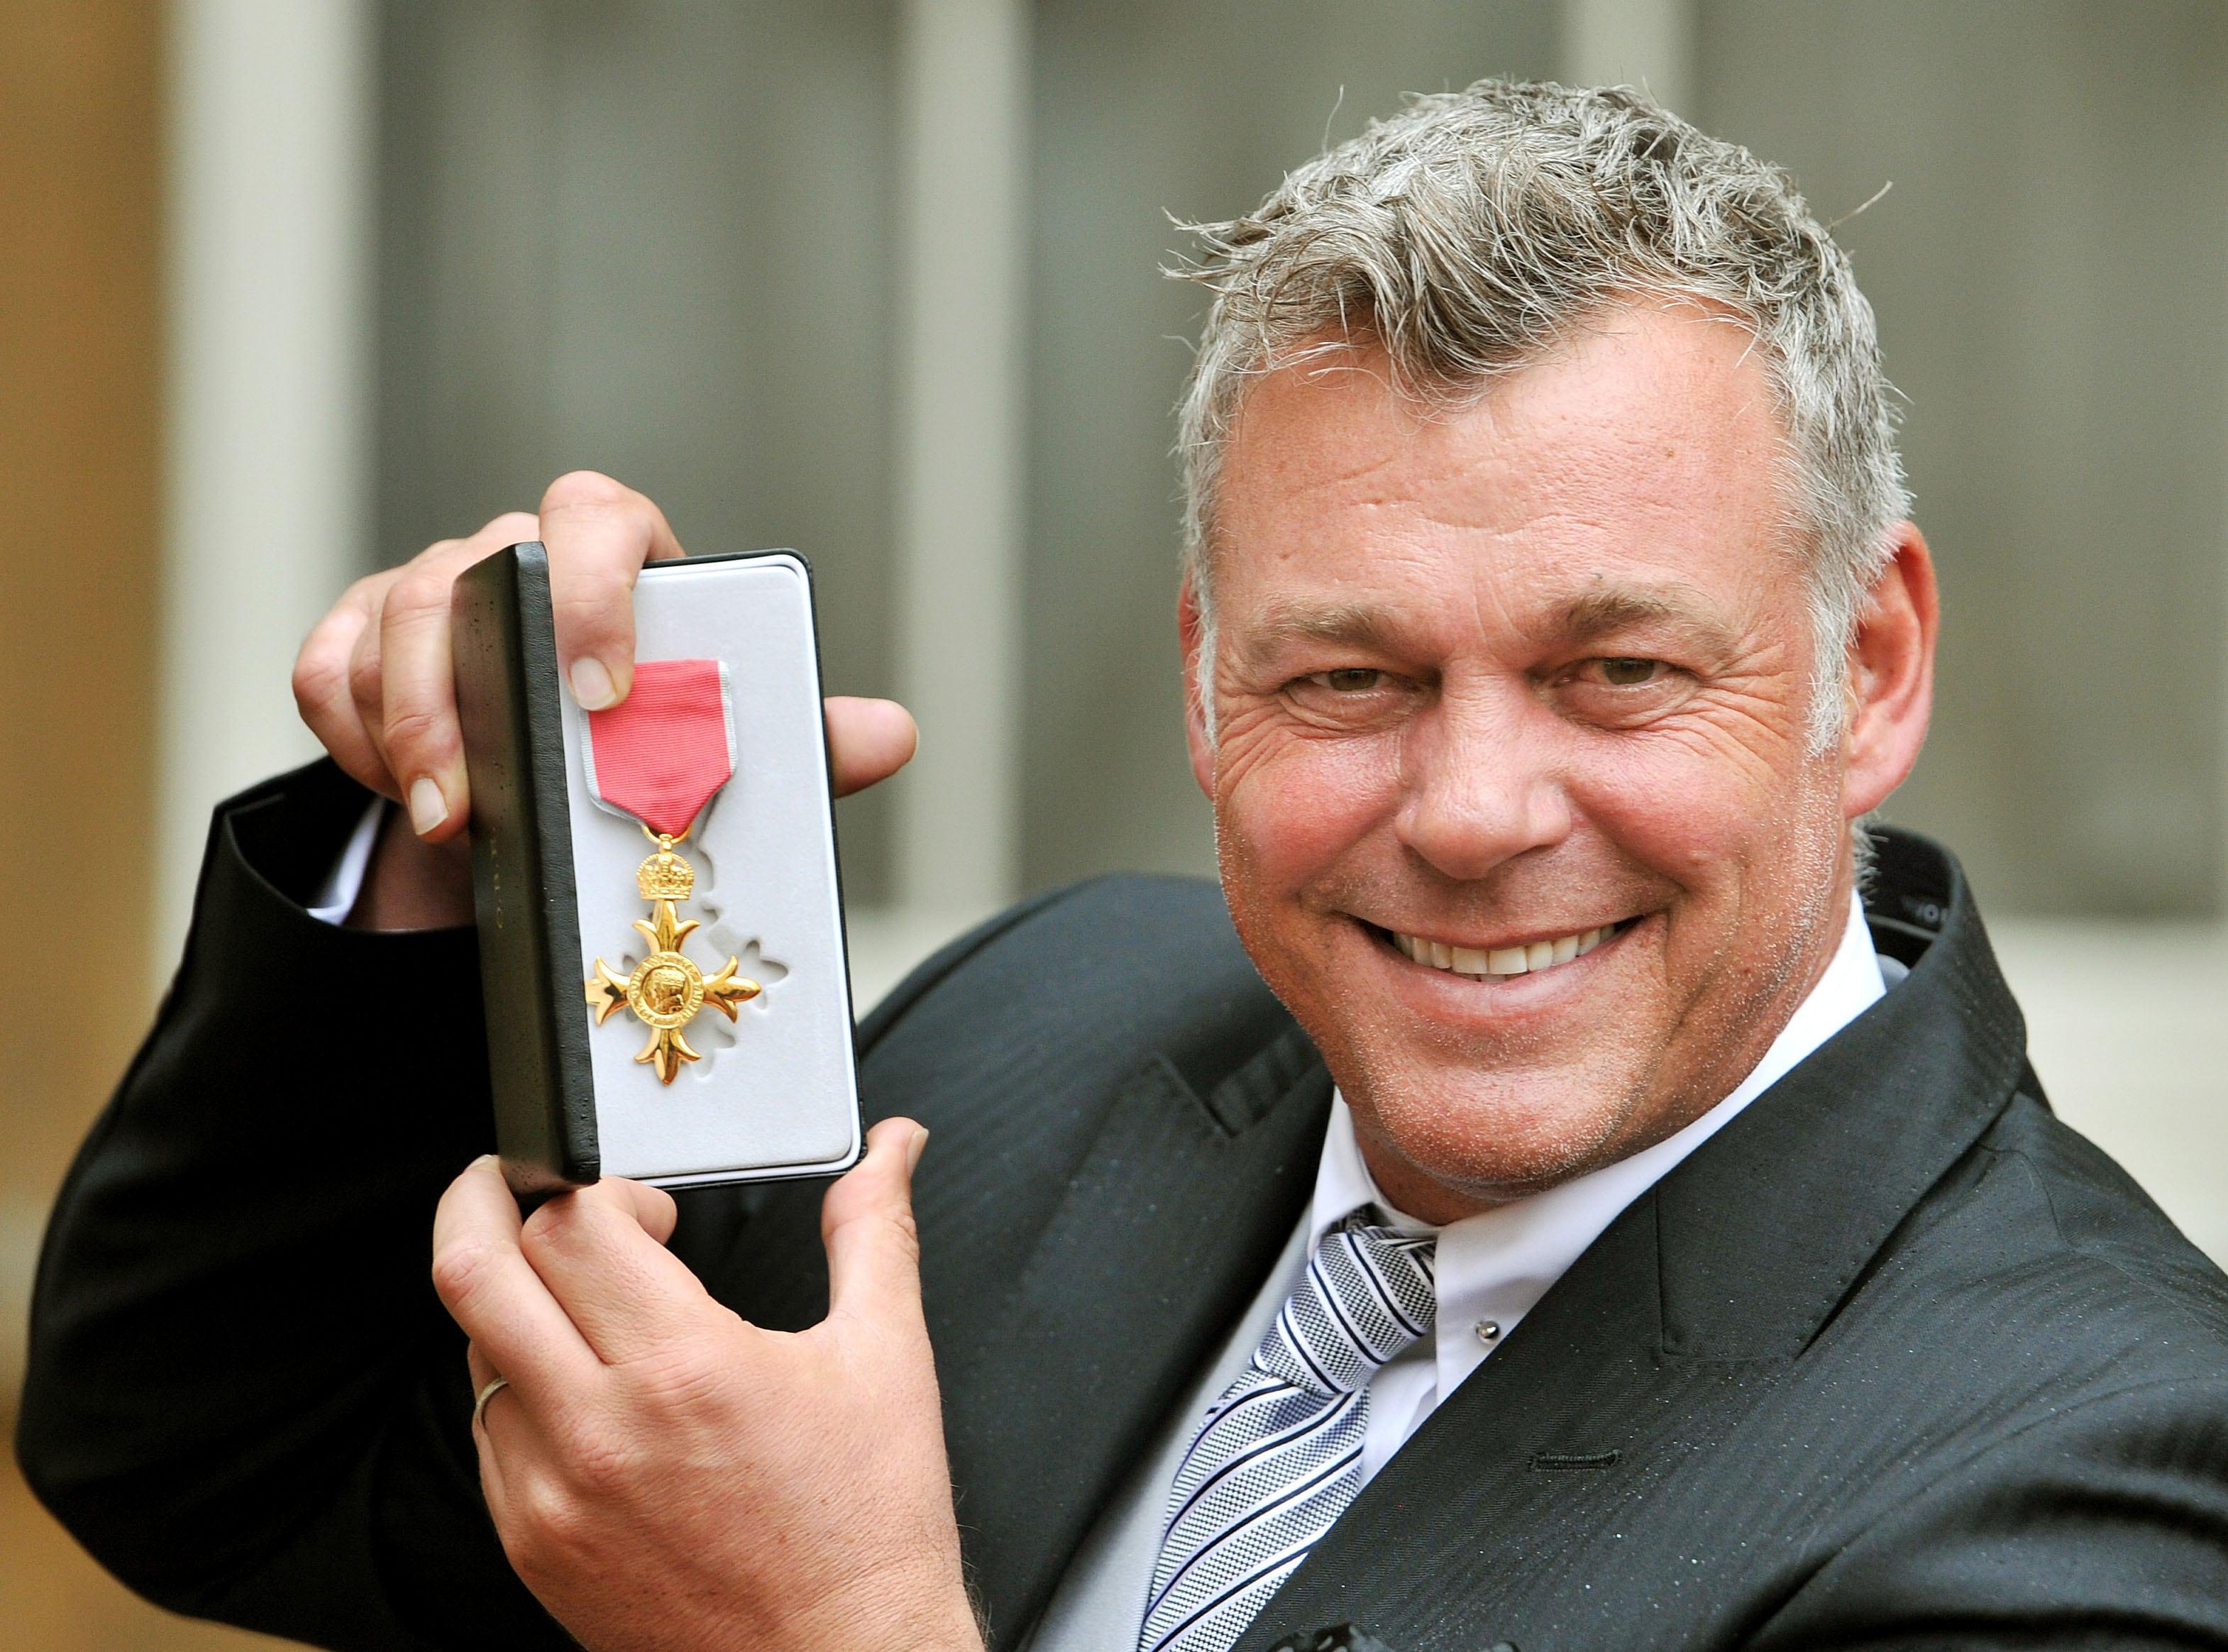 Darren Clarke with OBE medal in 2012